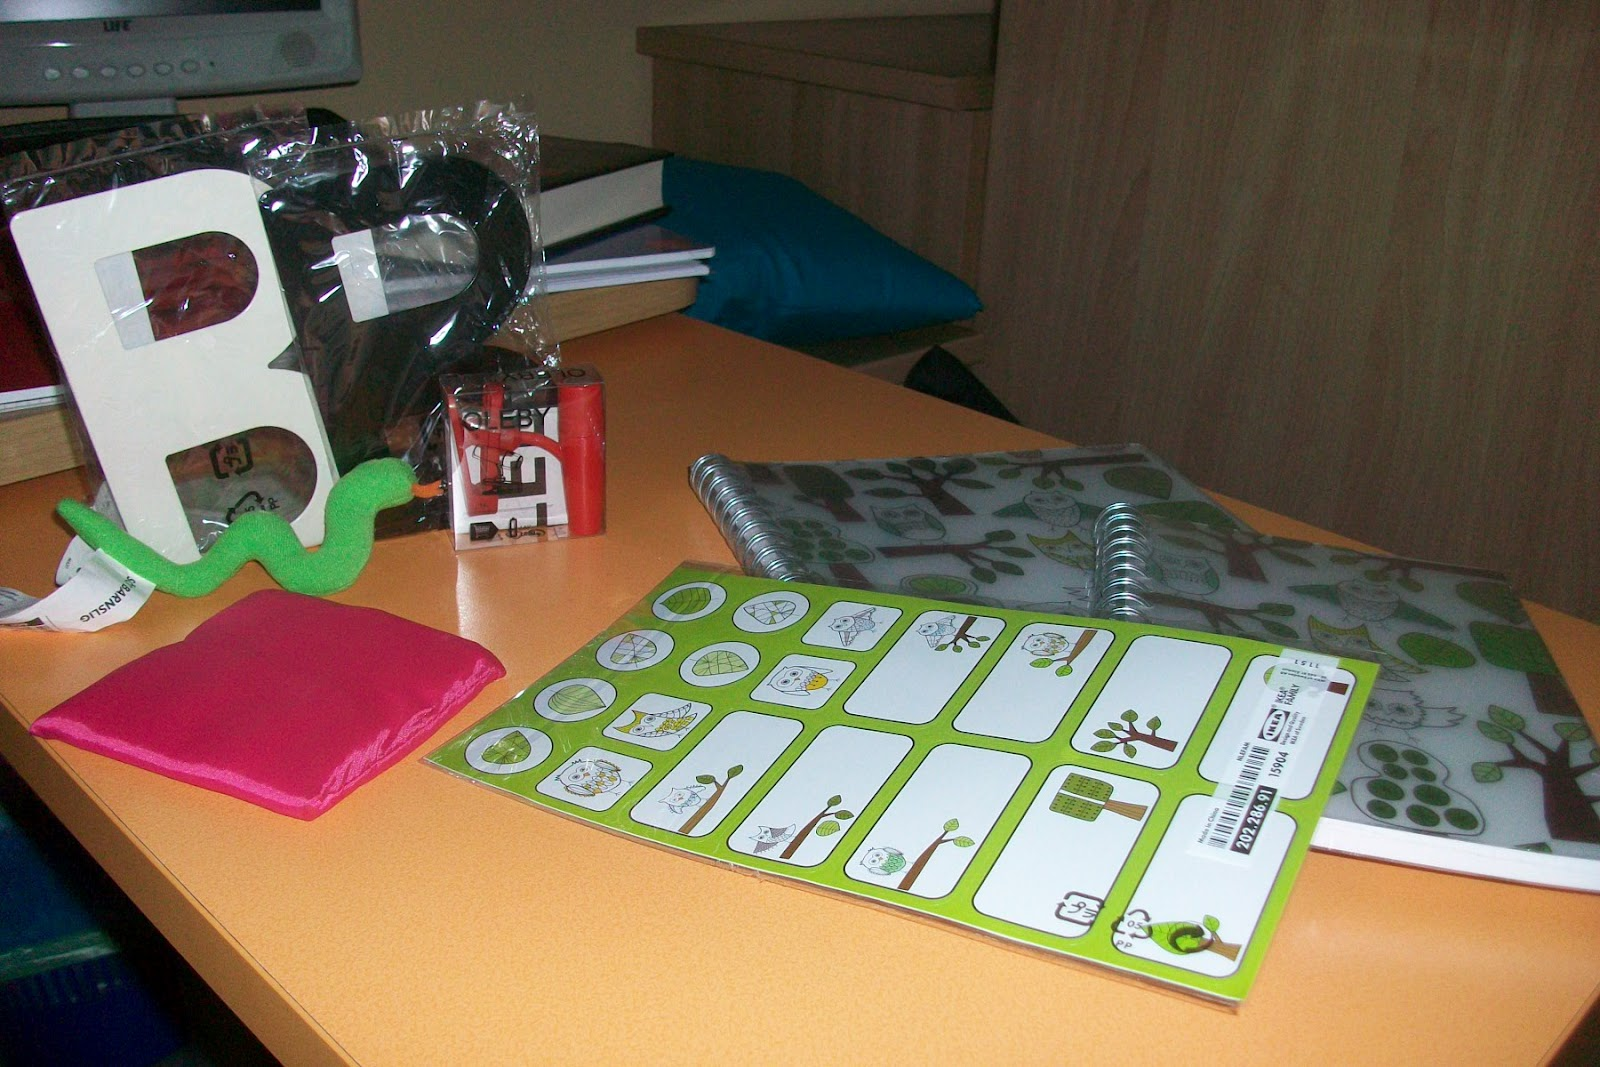 mobili con gufi: mint and coral baby mobile elephant and balloon ... - Comodino Con Gufi